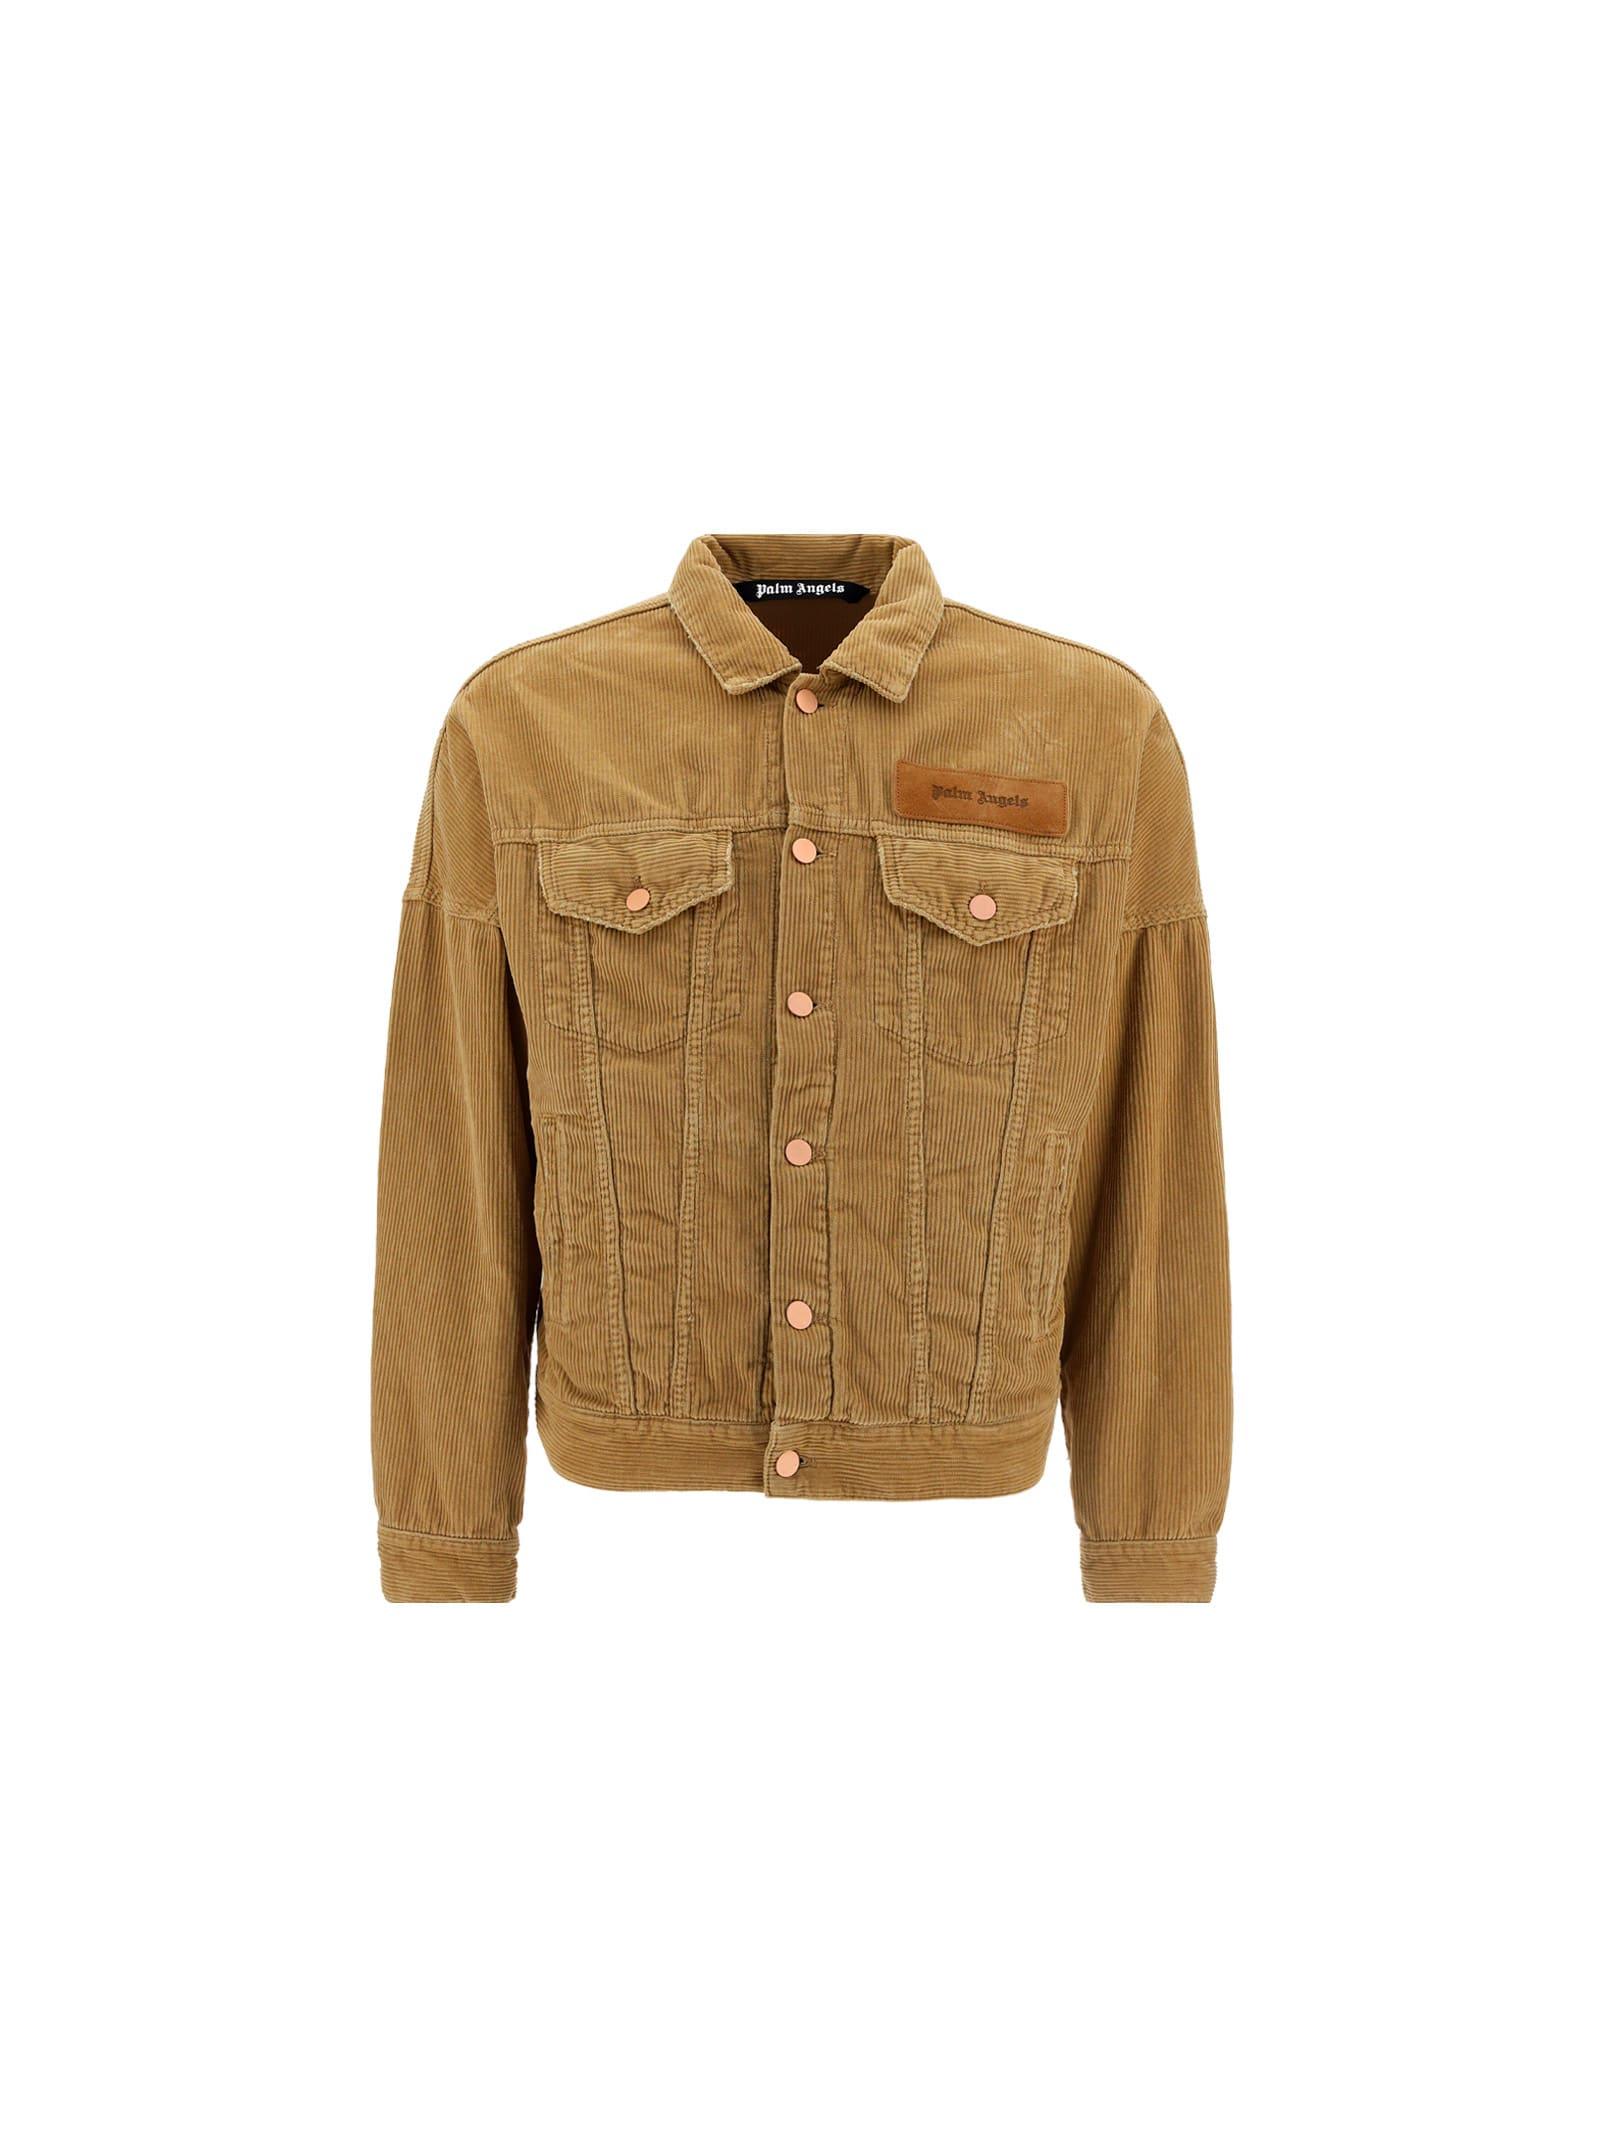 Palm Angels Corduroy Jacket